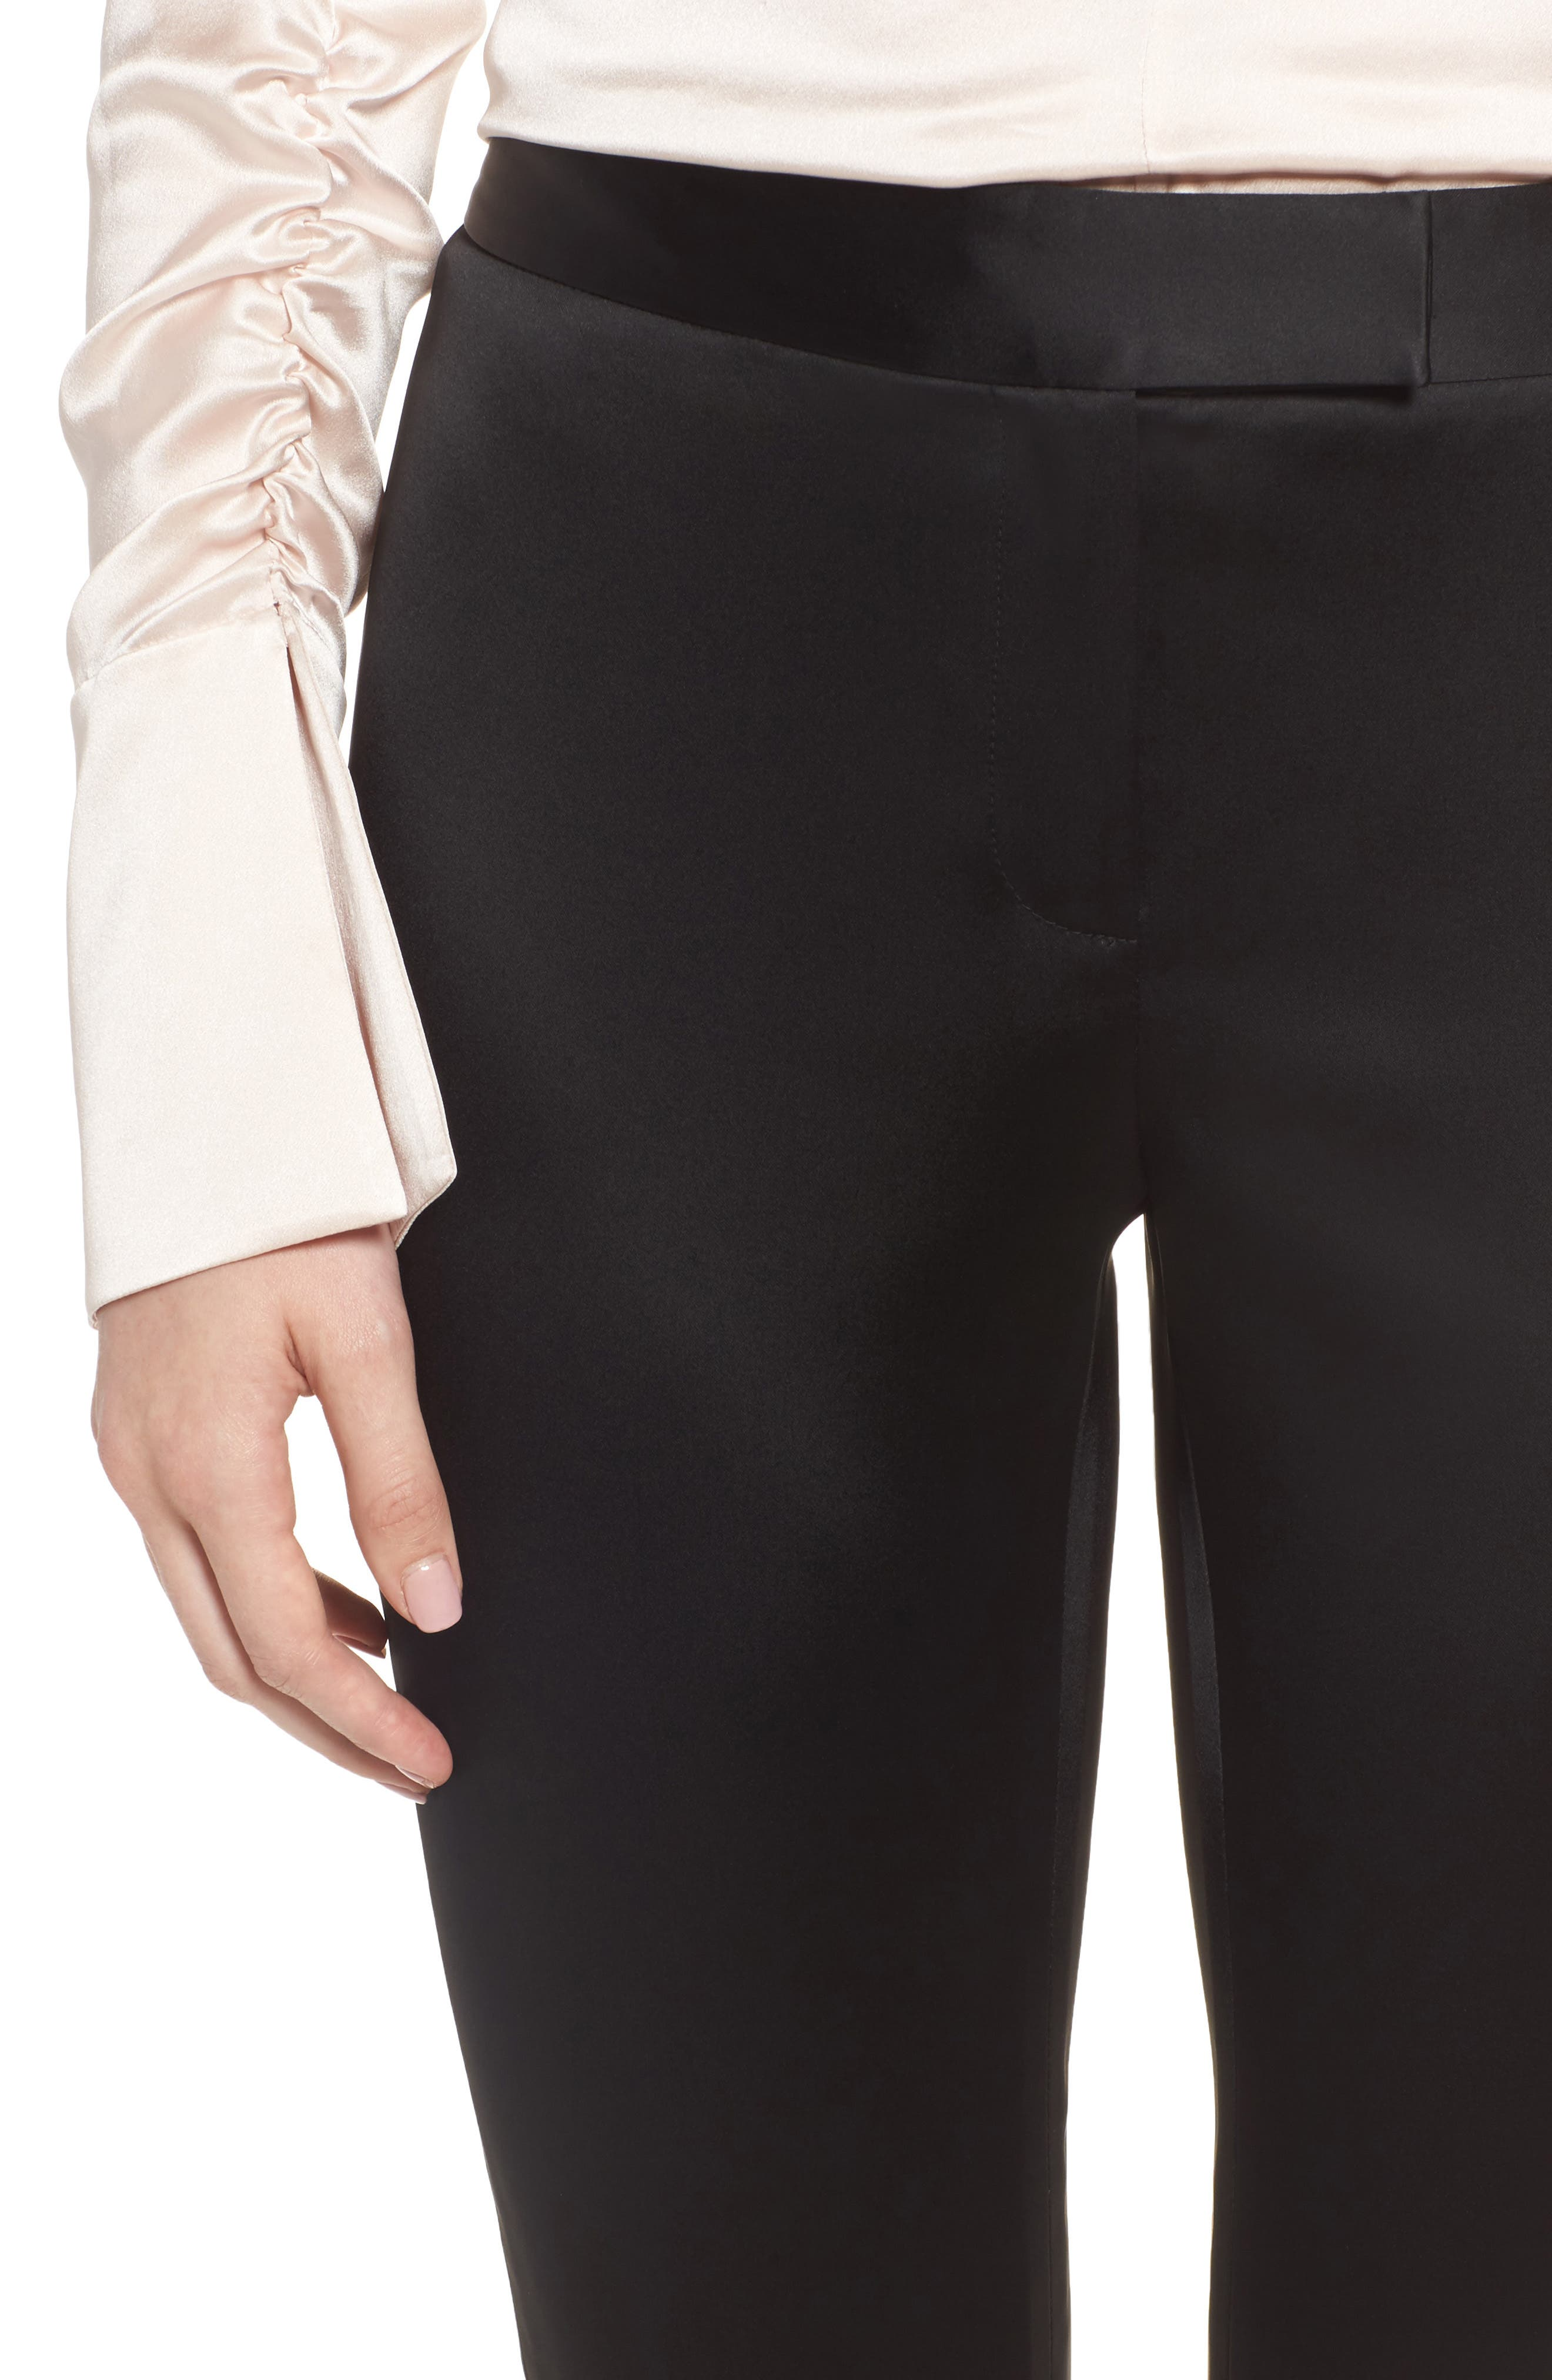 Stretch Satin Skinny Trousers,                             Alternate thumbnail 4, color,                             Black